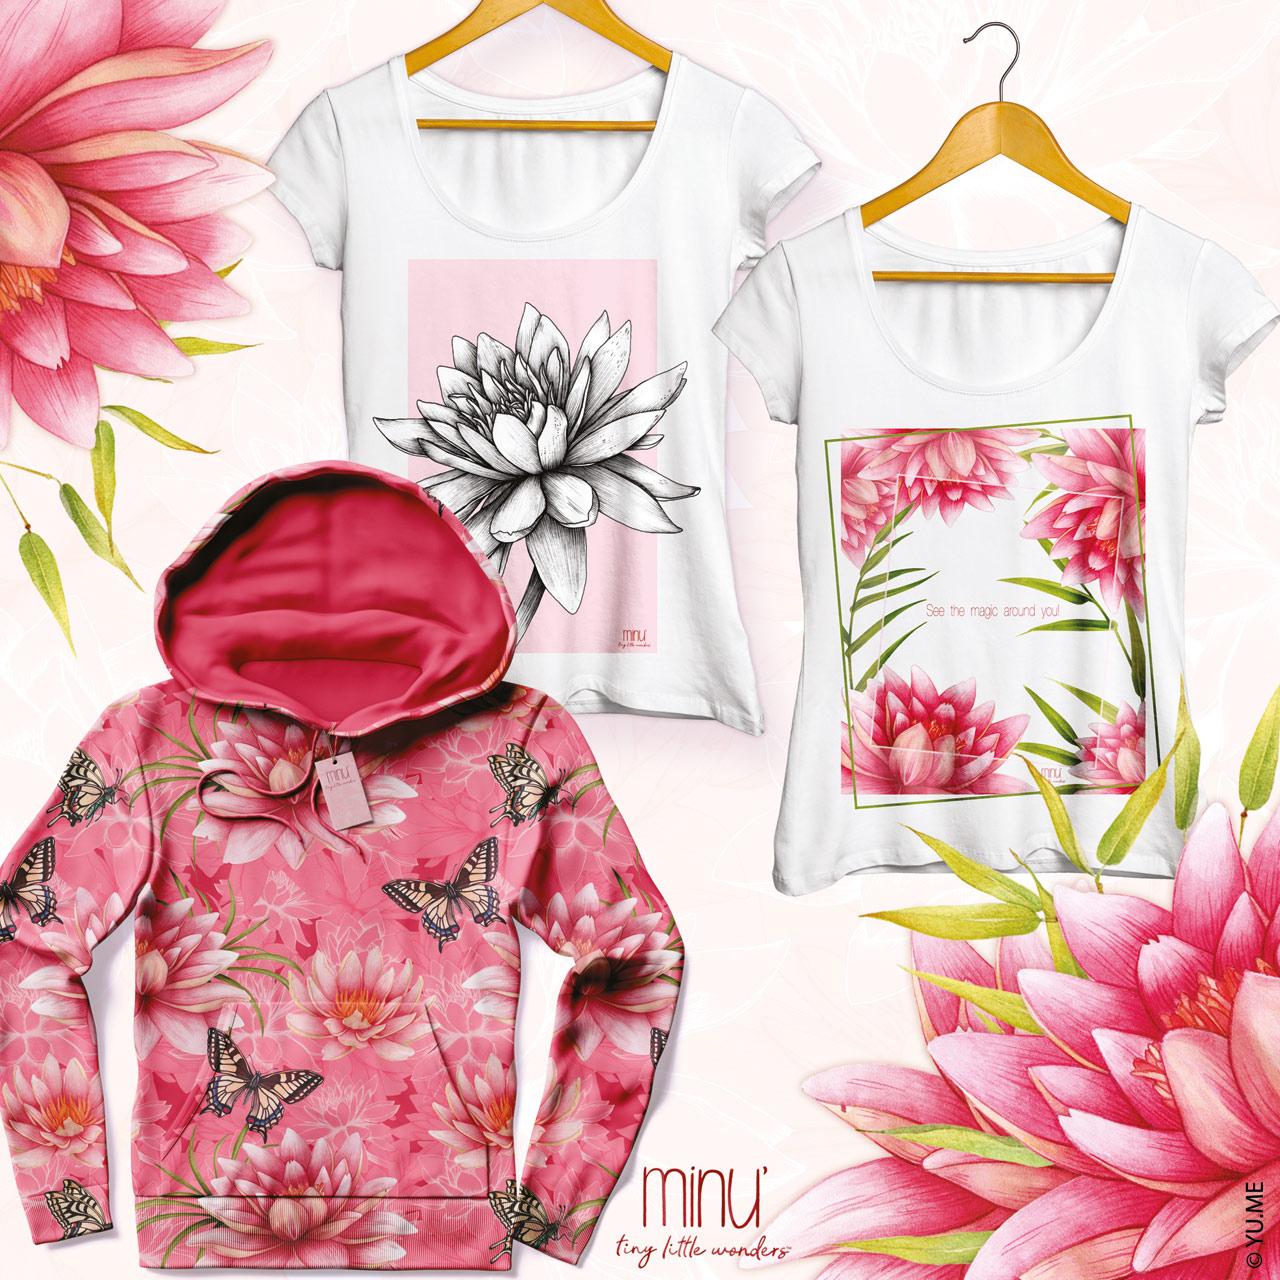 yume nature apparel